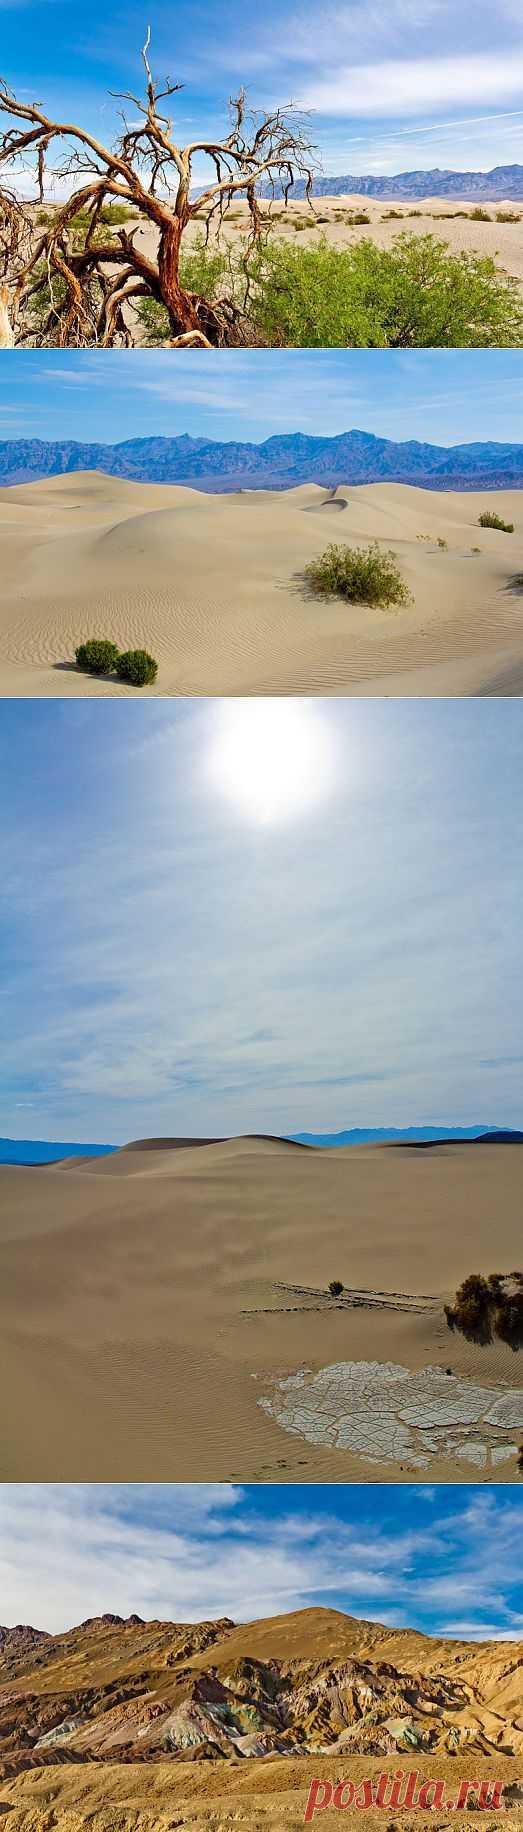 путешествия и прочее - Долина Смерти